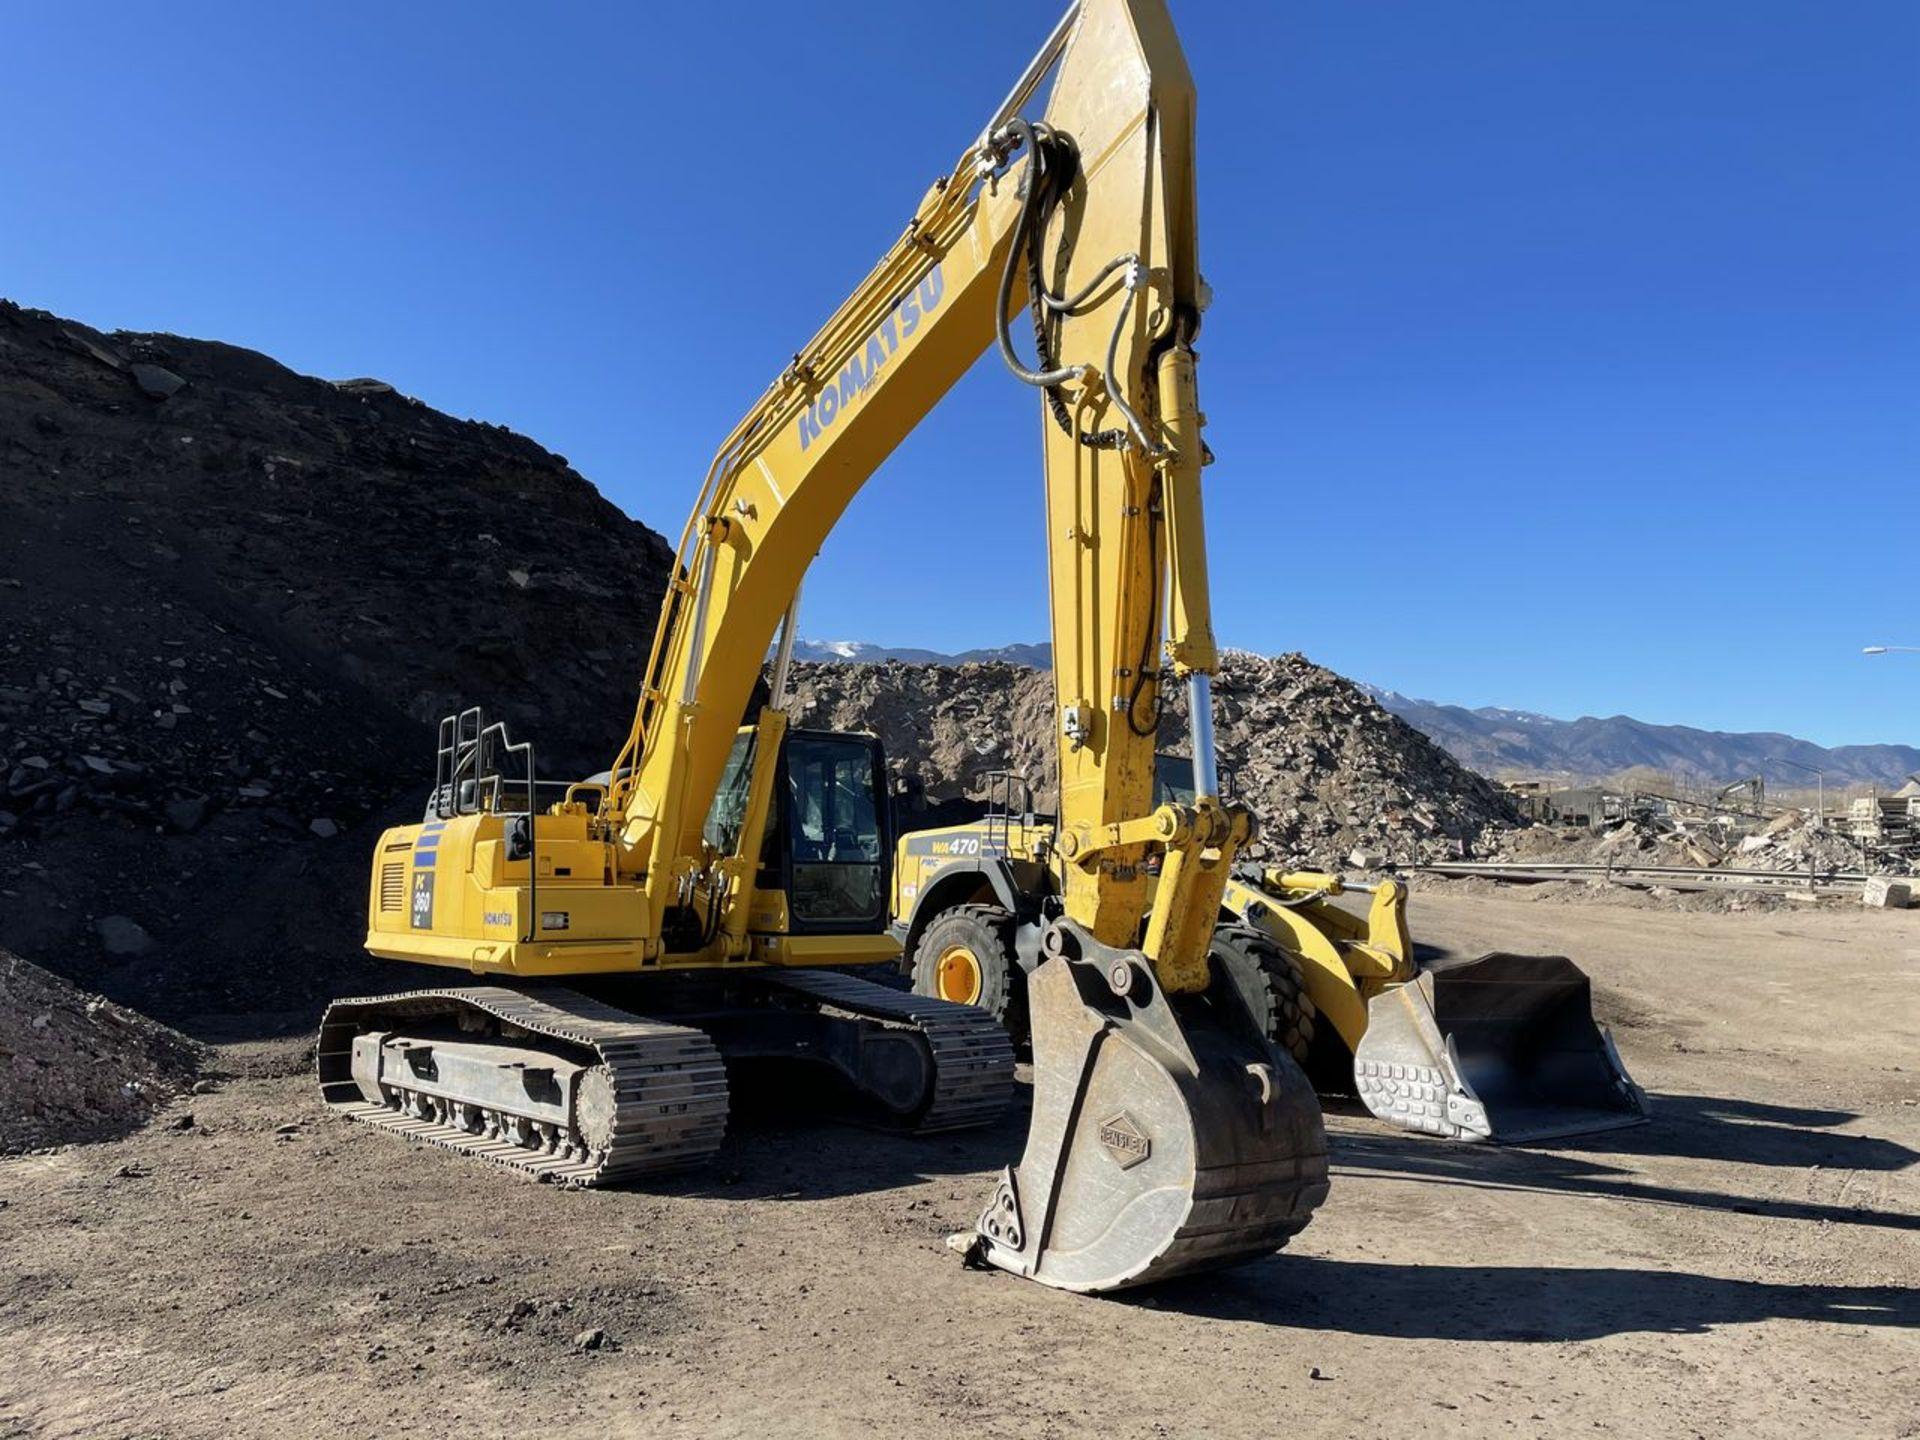 2018 Komatsu PC360LC-11 Hydraulic Crawler Excavator, S/N: A36863, PIN: KMTPC256CJWA36863; with 2,883 - Image 2 of 19